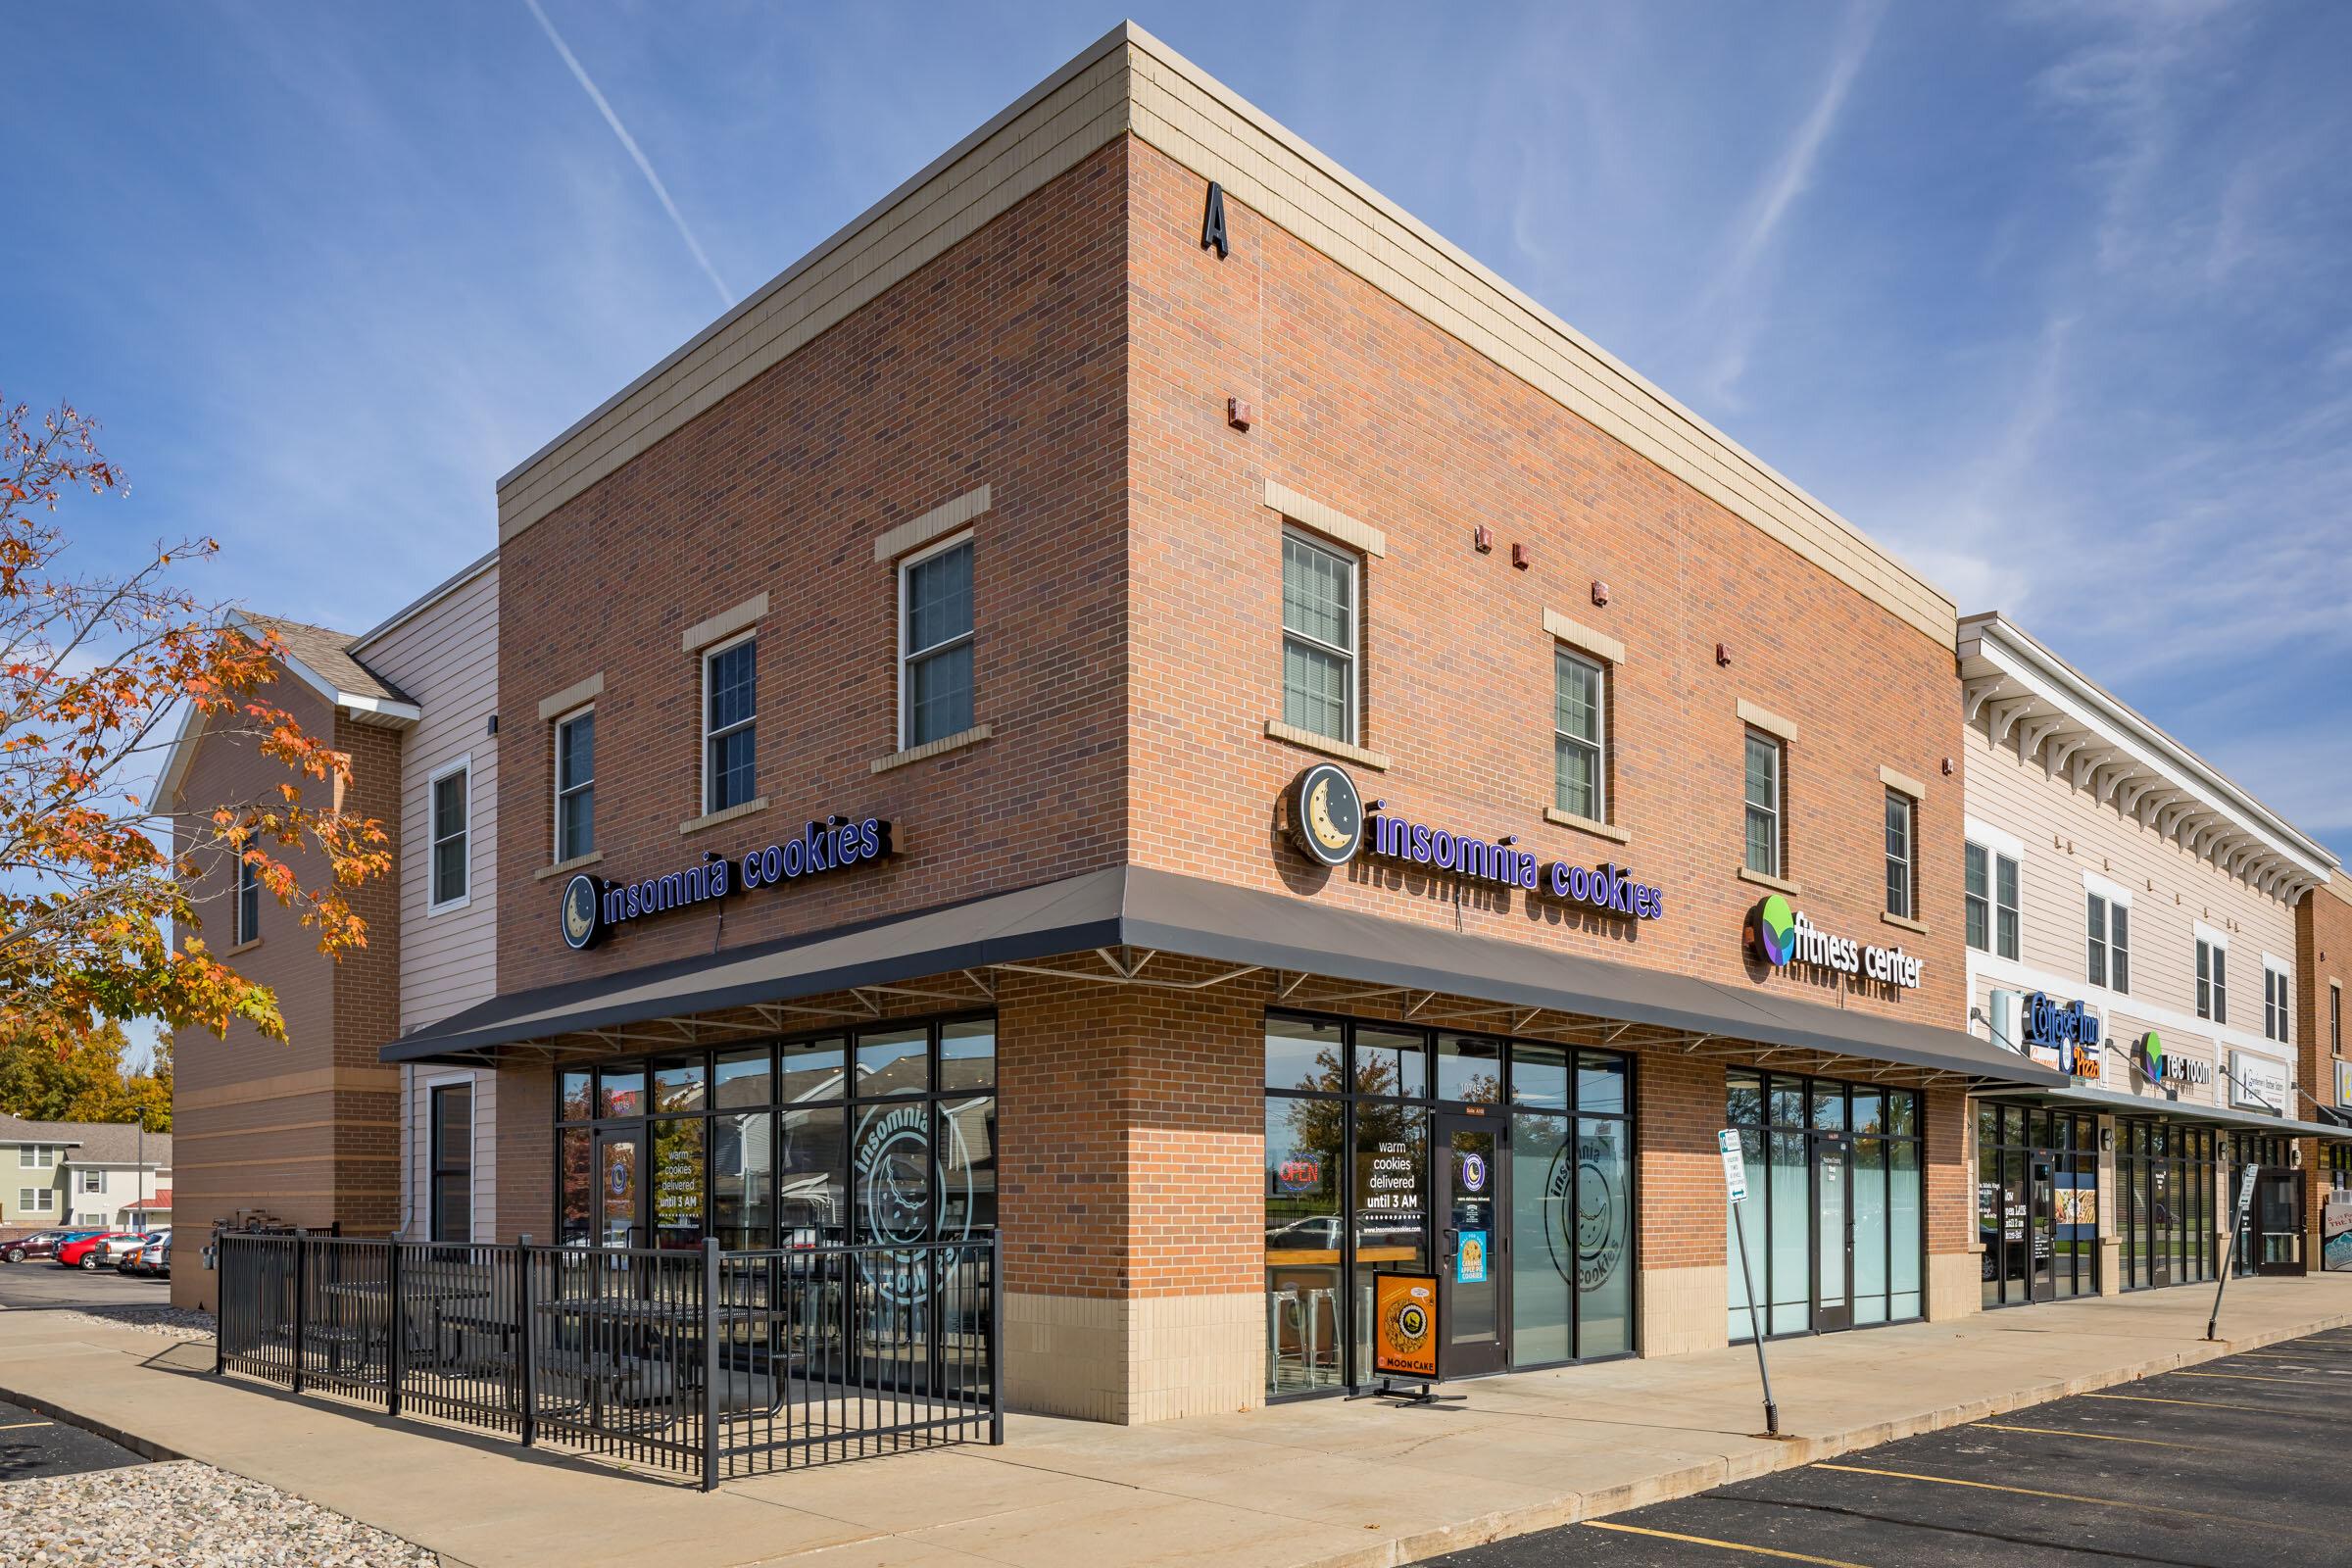 Grand Rapids Property Management Financial Services